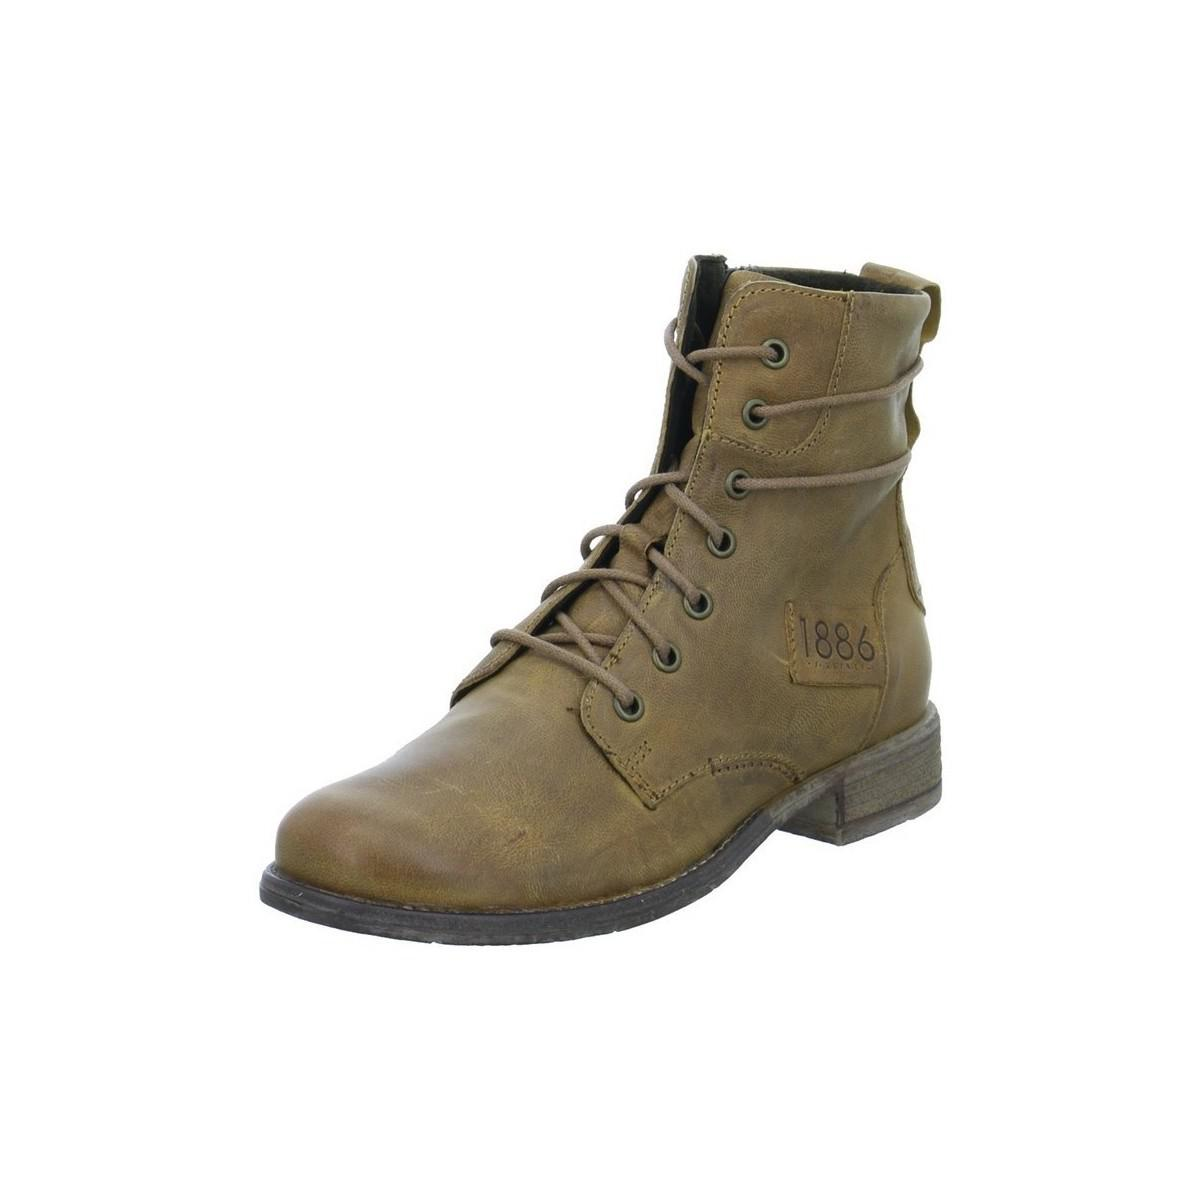 Josef Seibel Sienna 63 Women's Low Ankle Boots In Brown